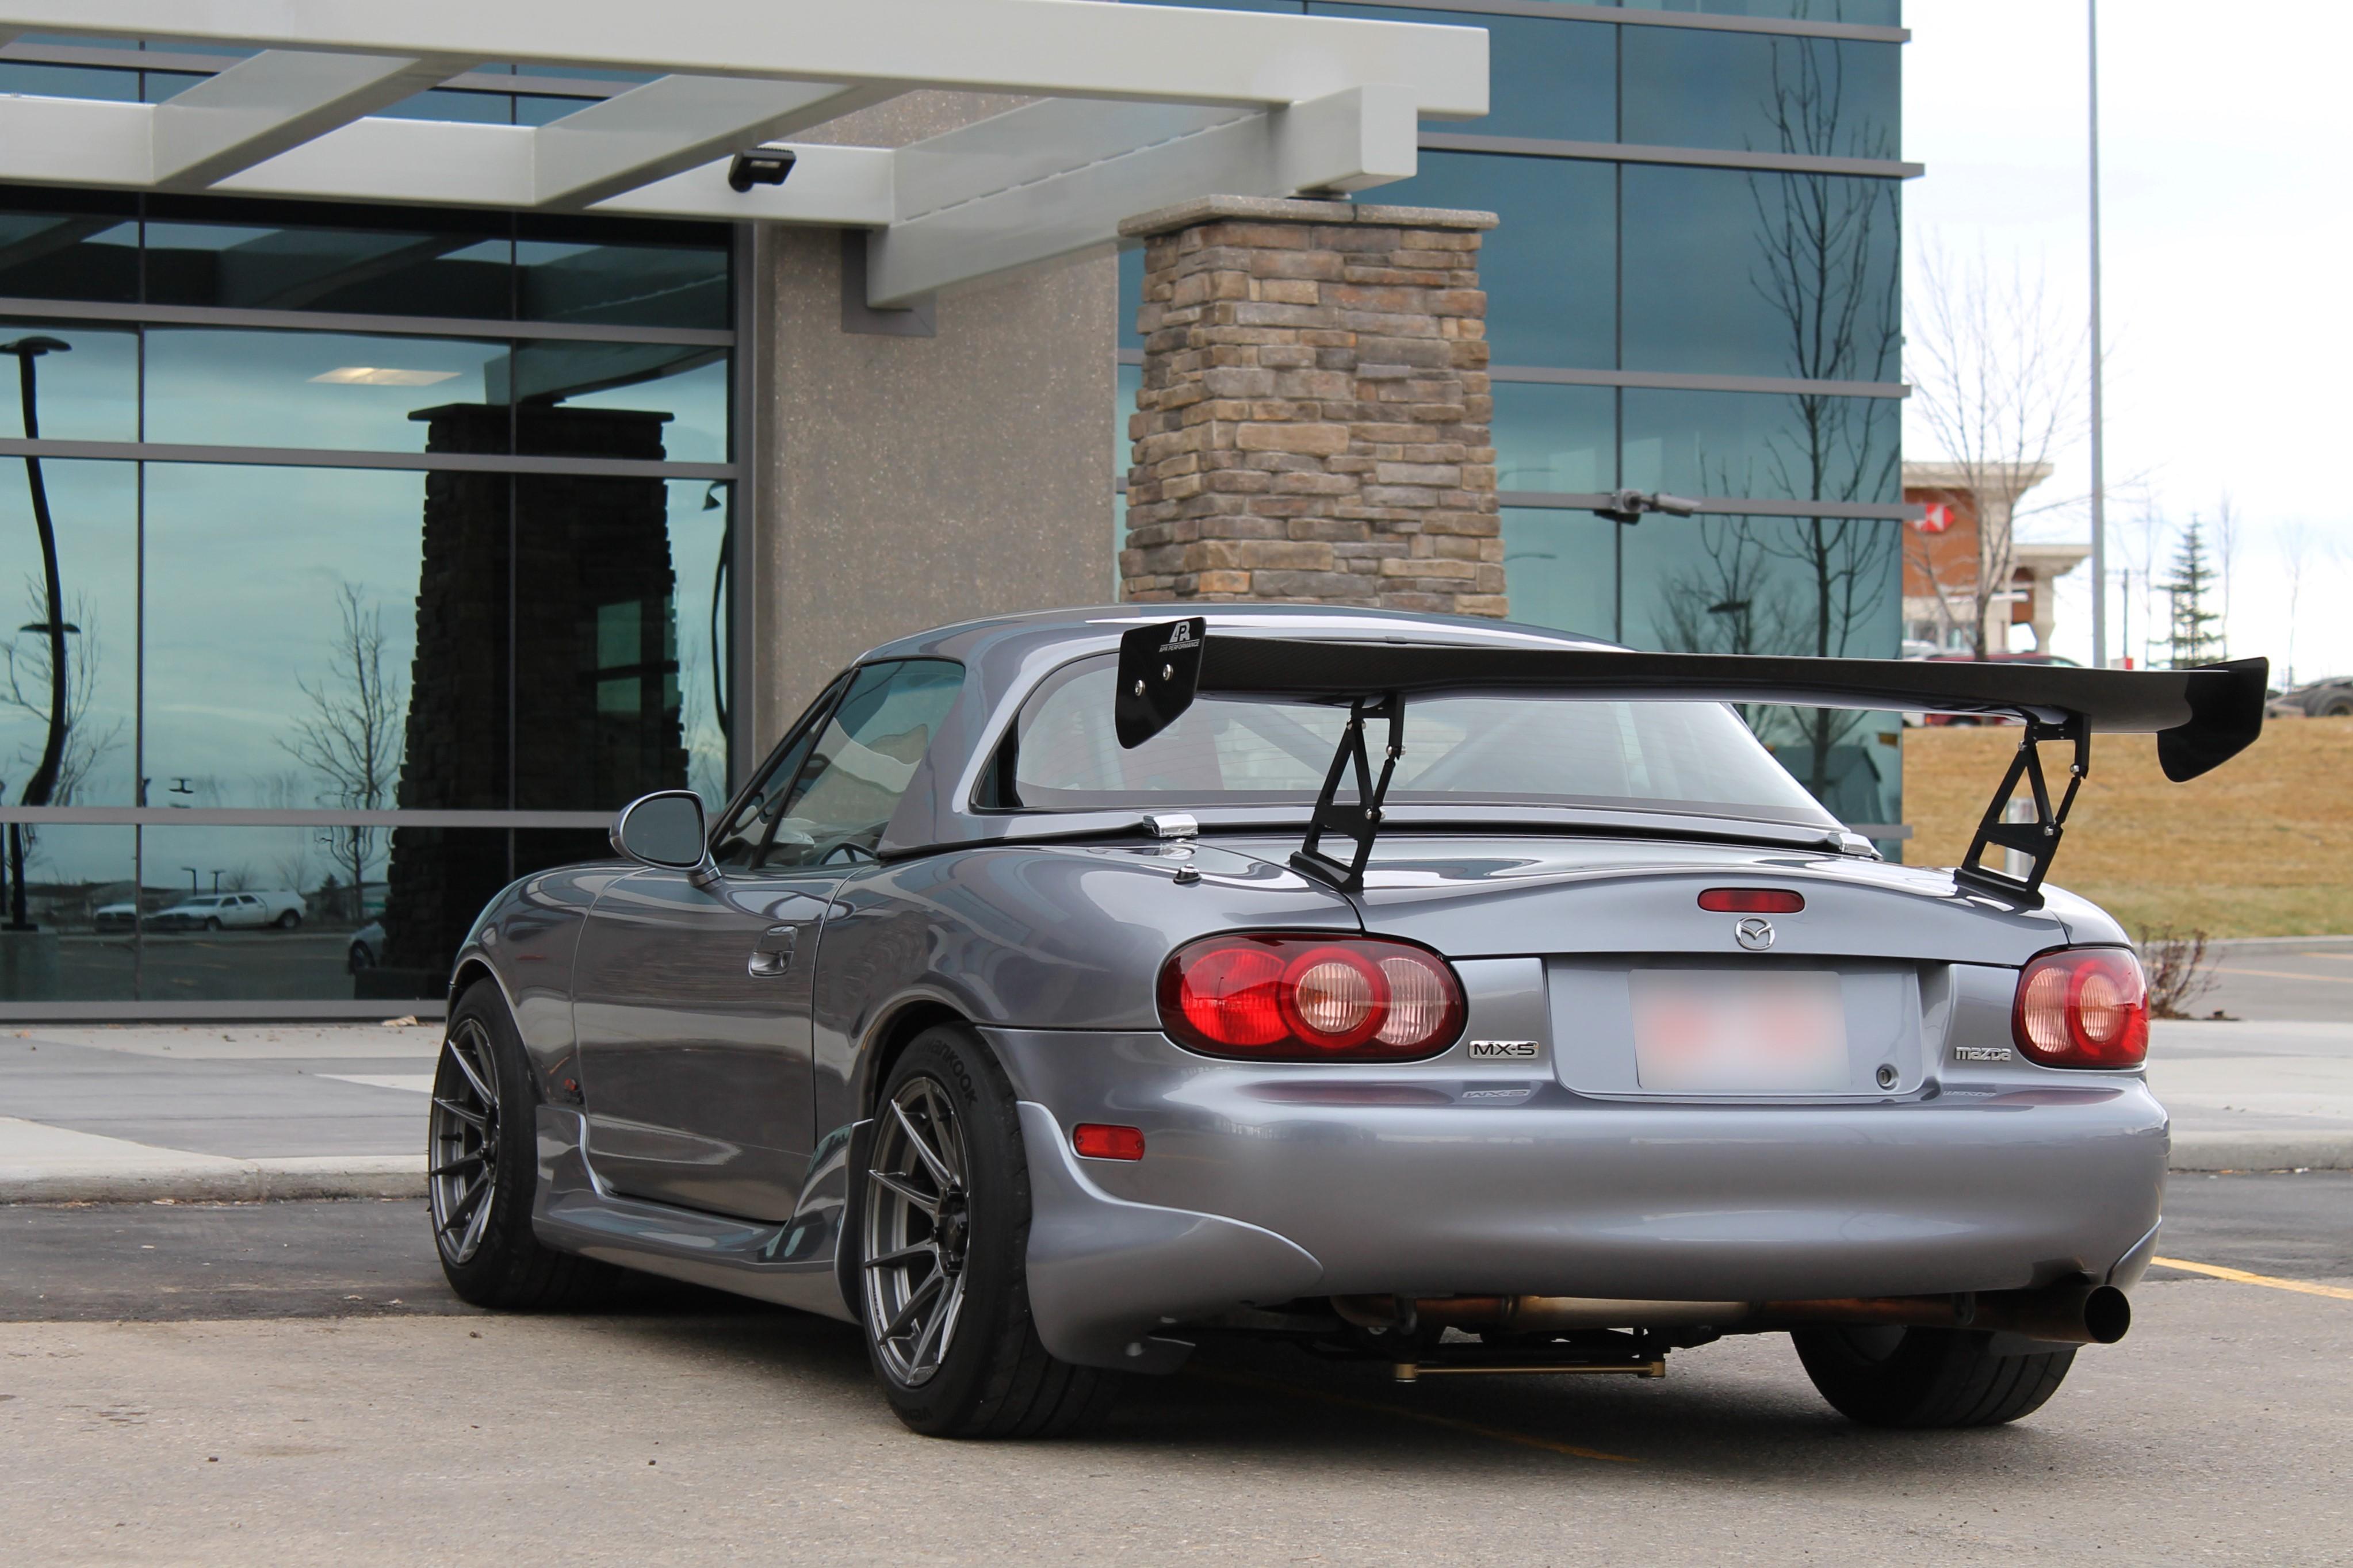 mx mazda myautoworld miata priced com for rf sale autonews